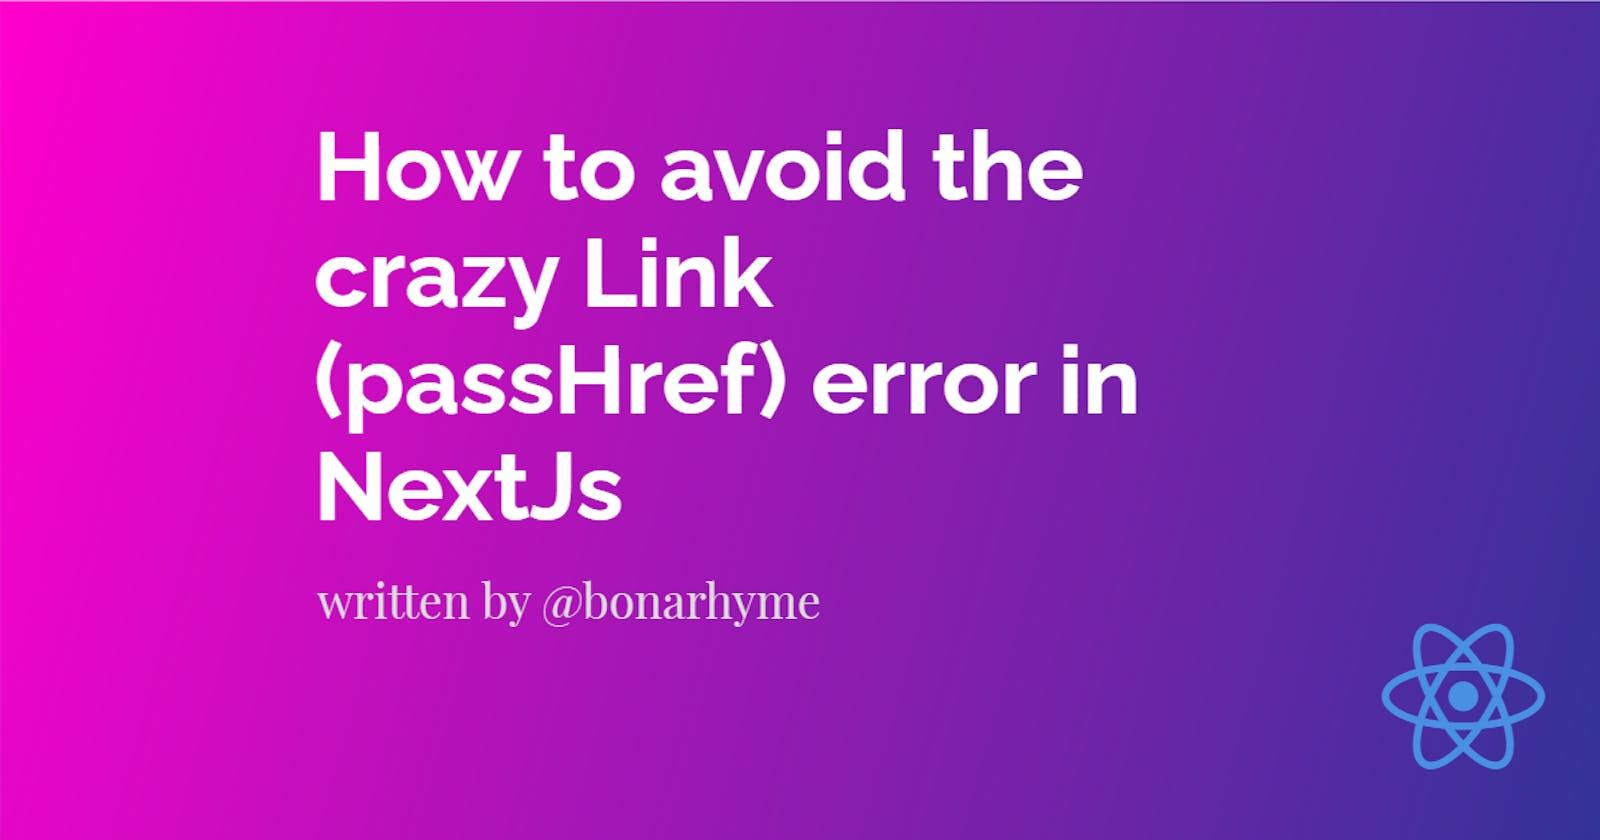 How to avoid the crazy Link (passHref) error in NextJs